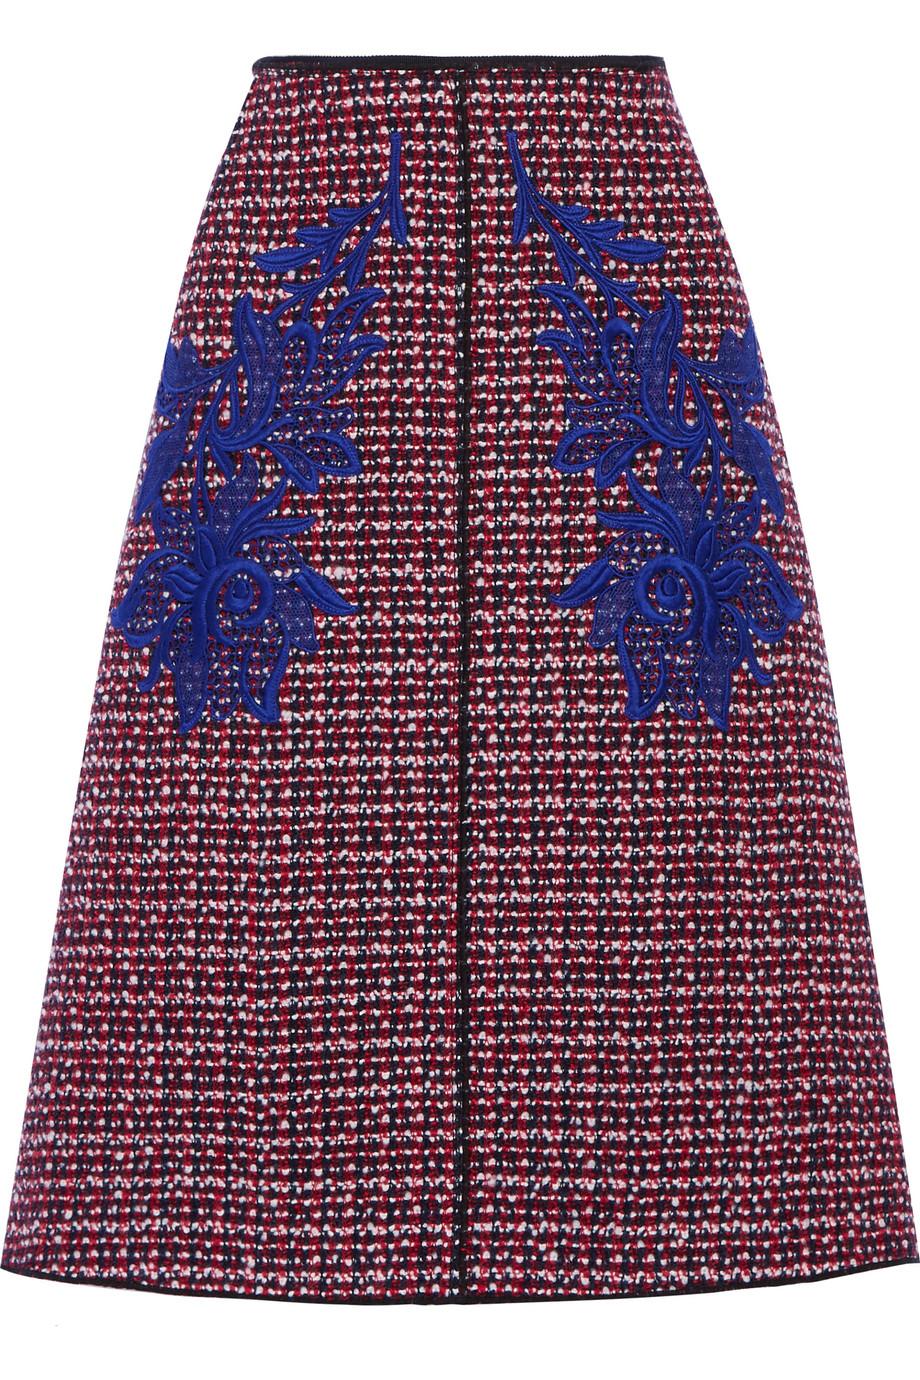 Marc Jacobs Floral-Appliquéd Wool-Tweed Midi Skirt, Red/Blue, Women's, Size: 2